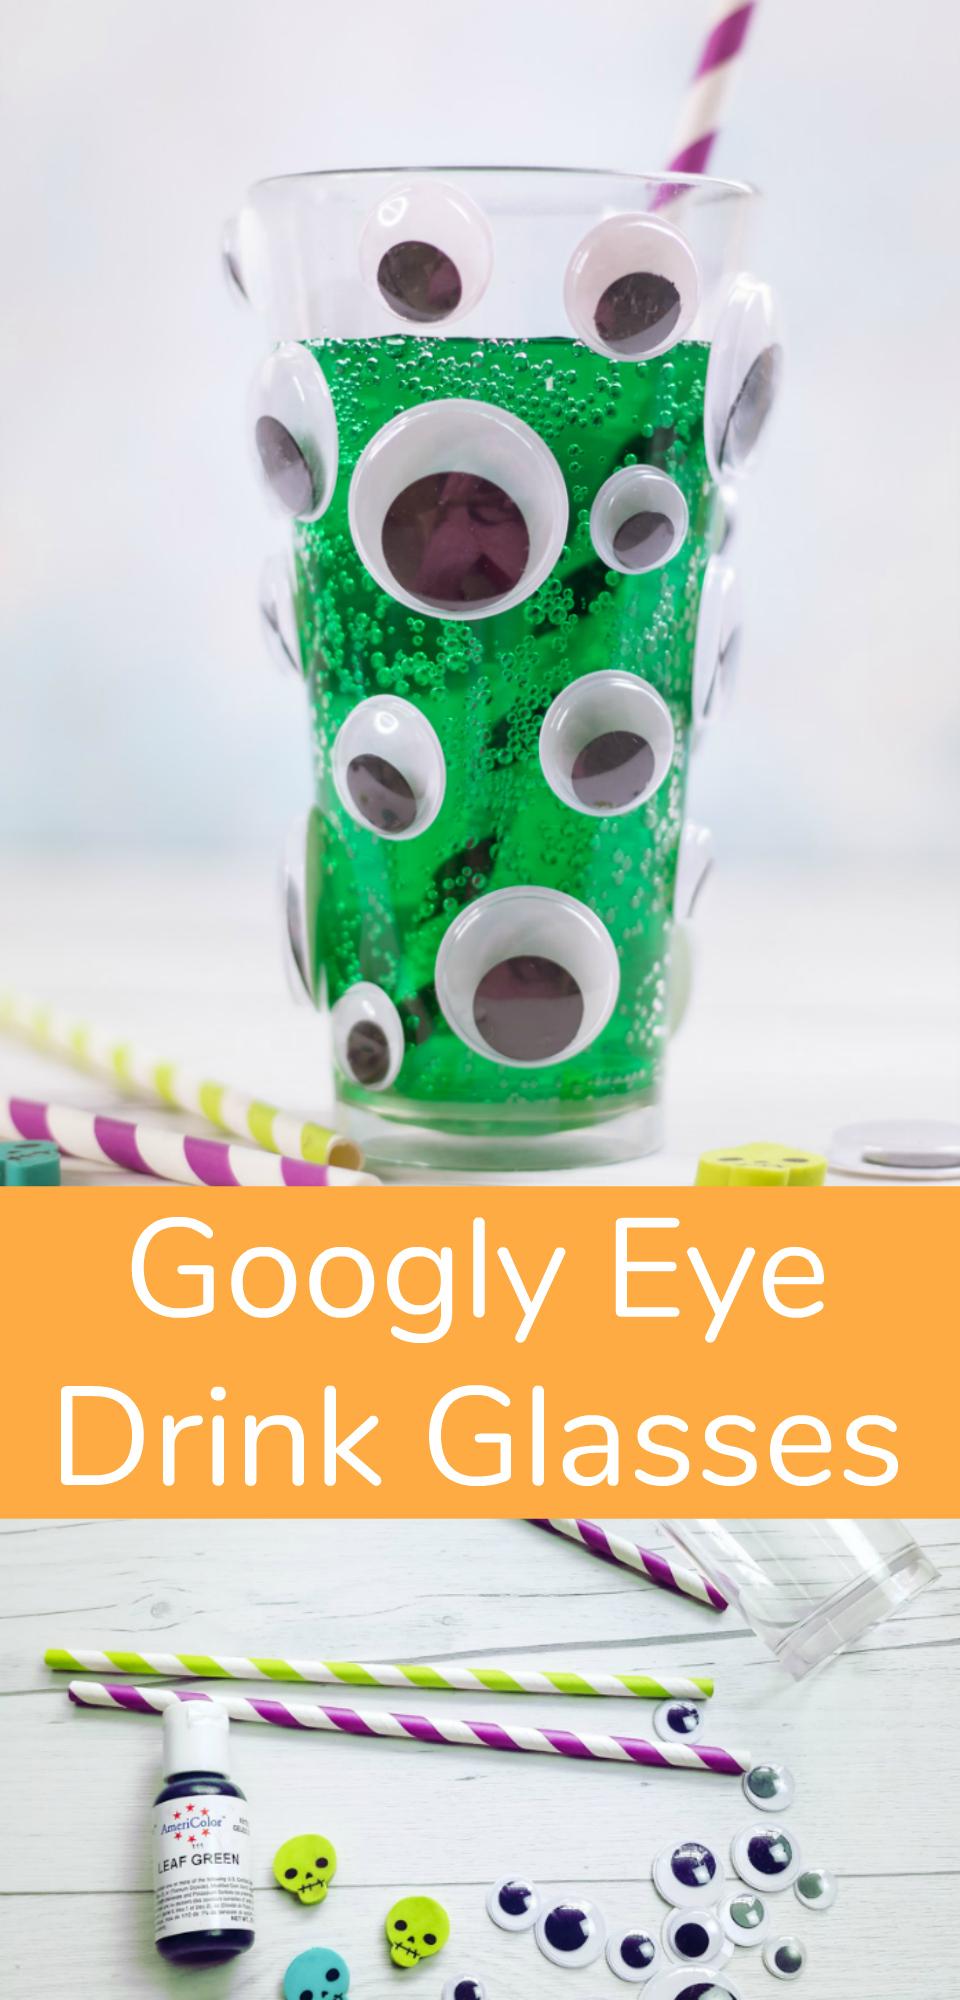 Googly Eye Drink Glasses for Halloween